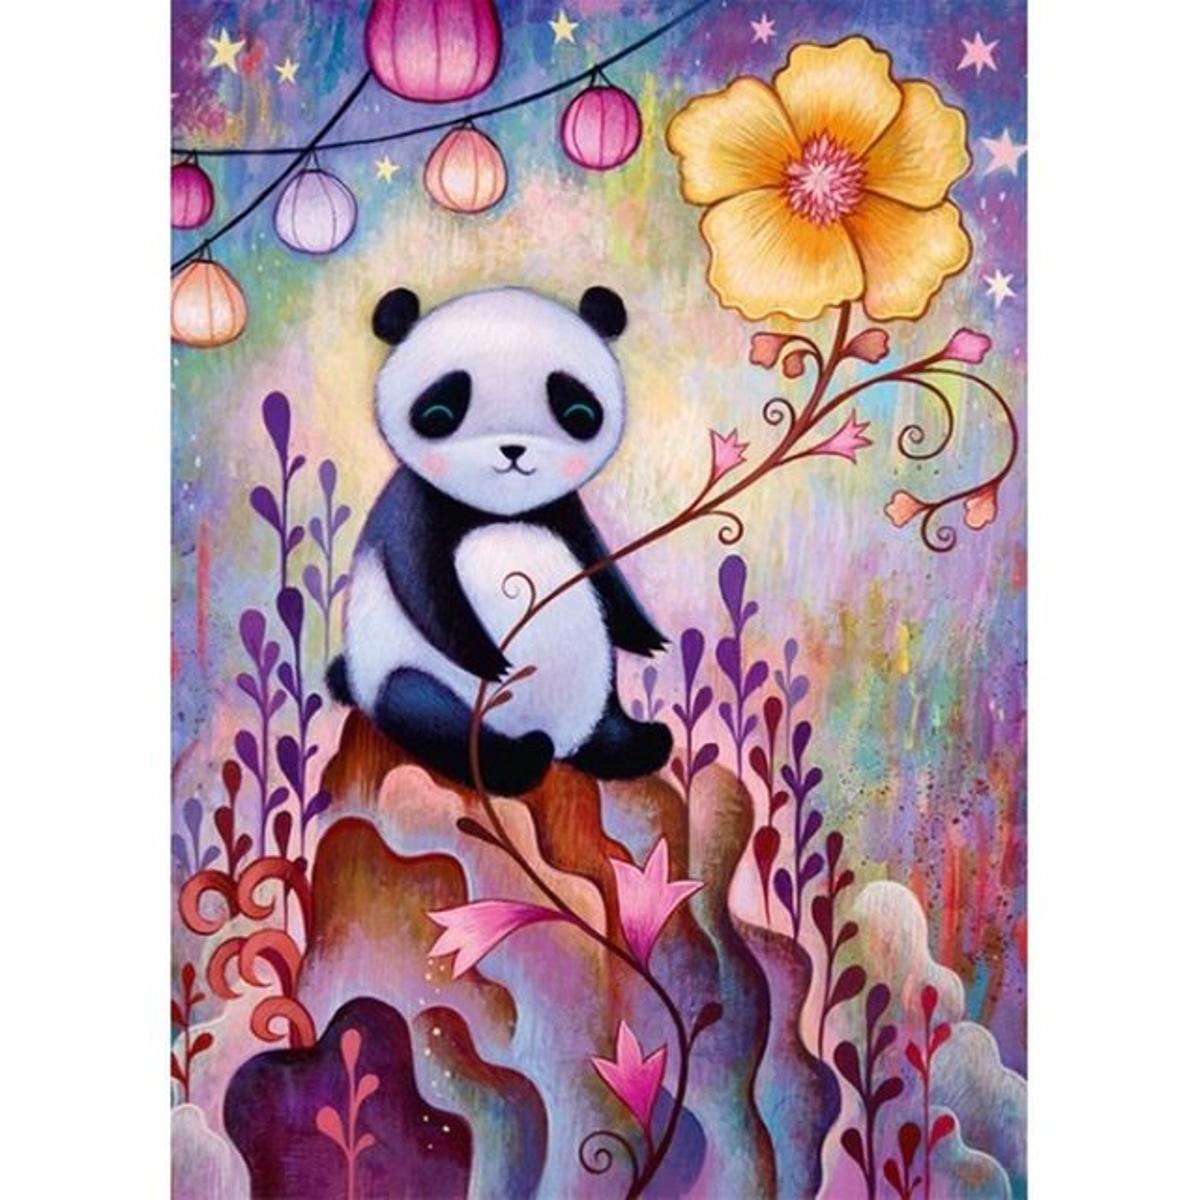 Puzzle Panda Naps